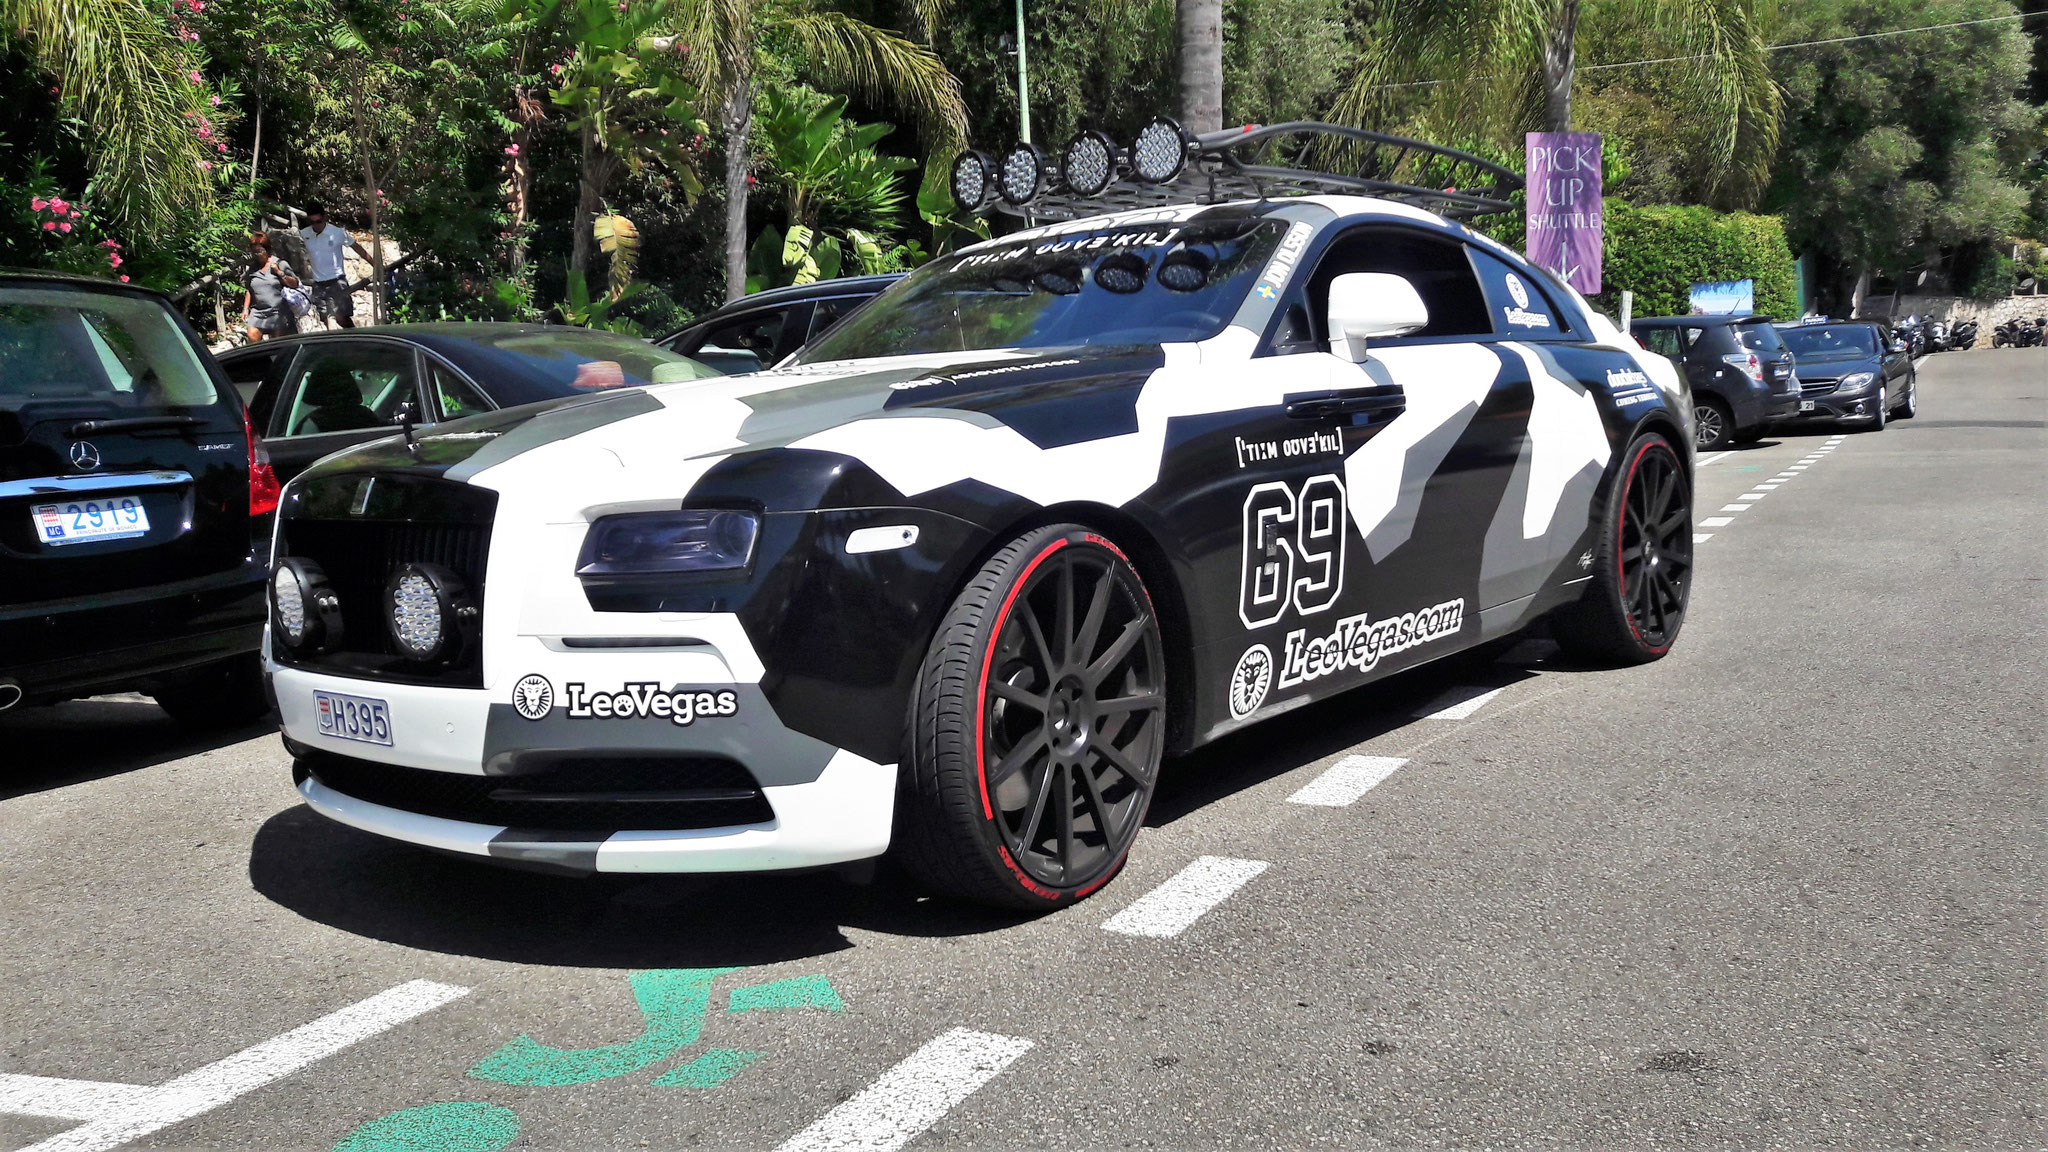 Rolls Royce Wraith (Jon Olsson) - H395 (MC)